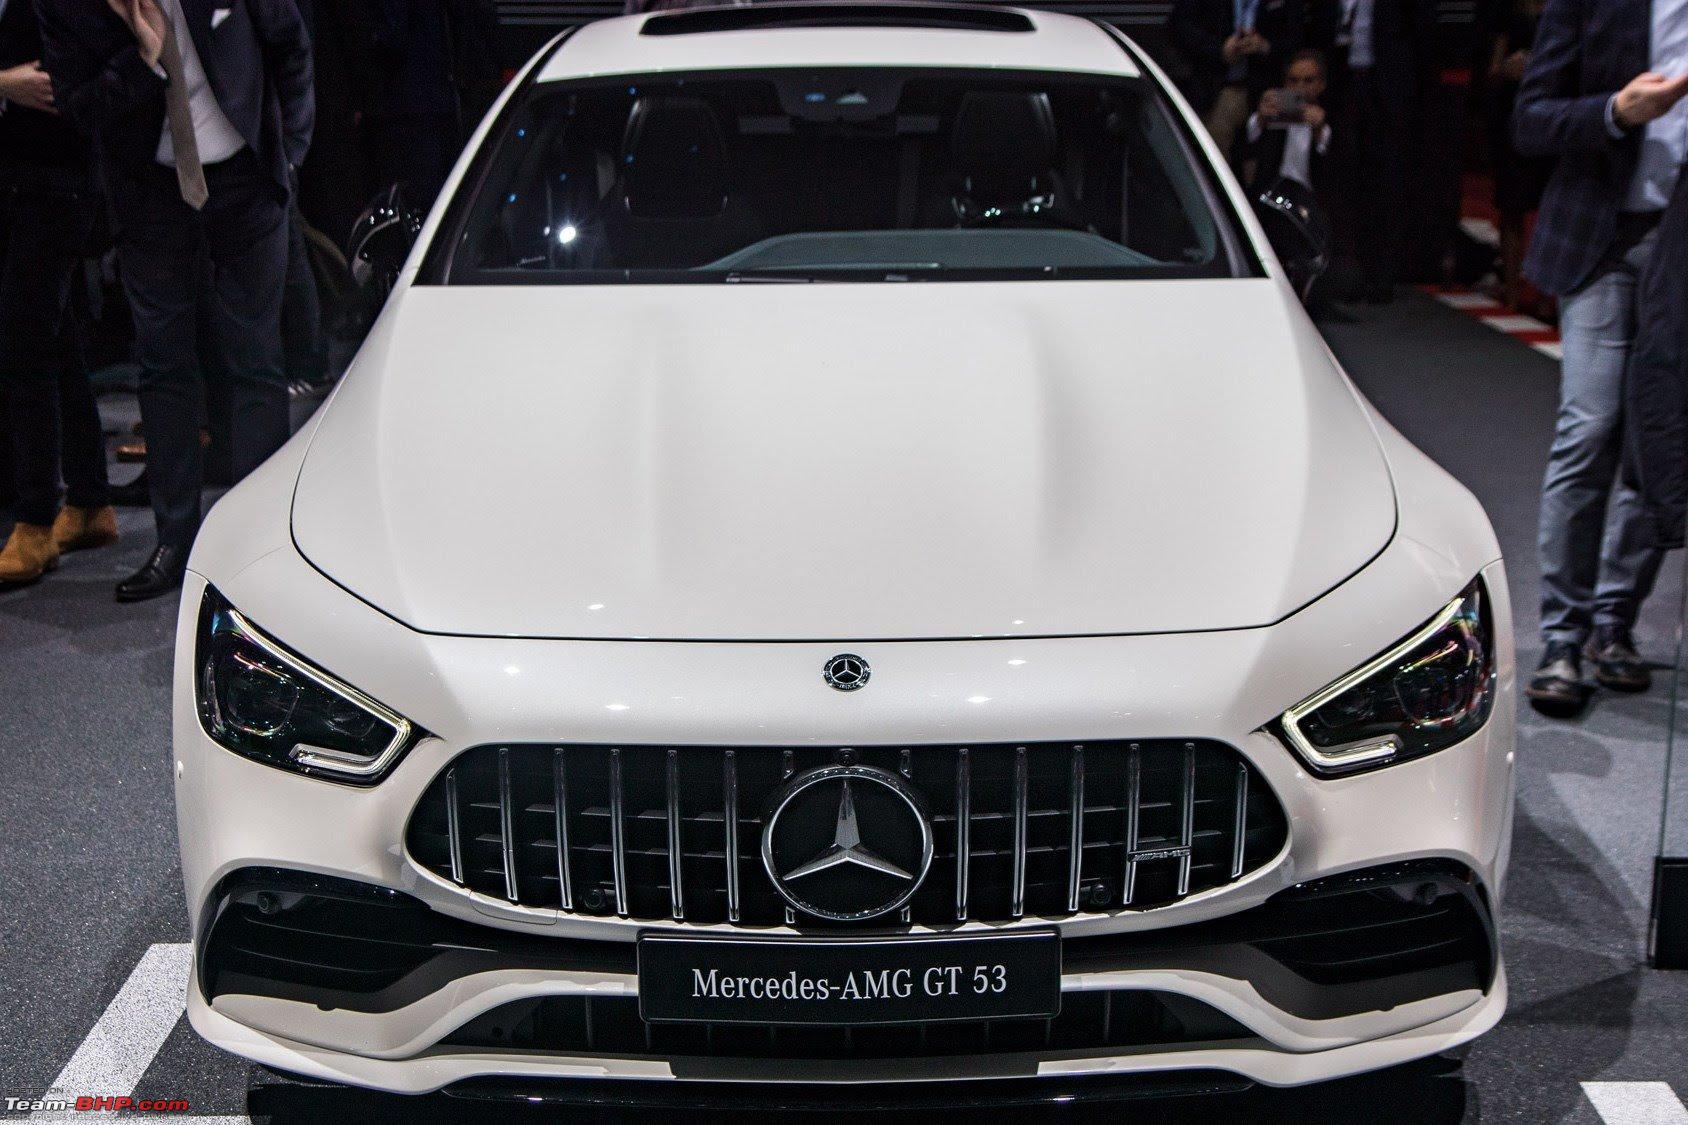 Mercedes Amg Gt 4 Door Coupe Unveiled Geneva Team Bhp